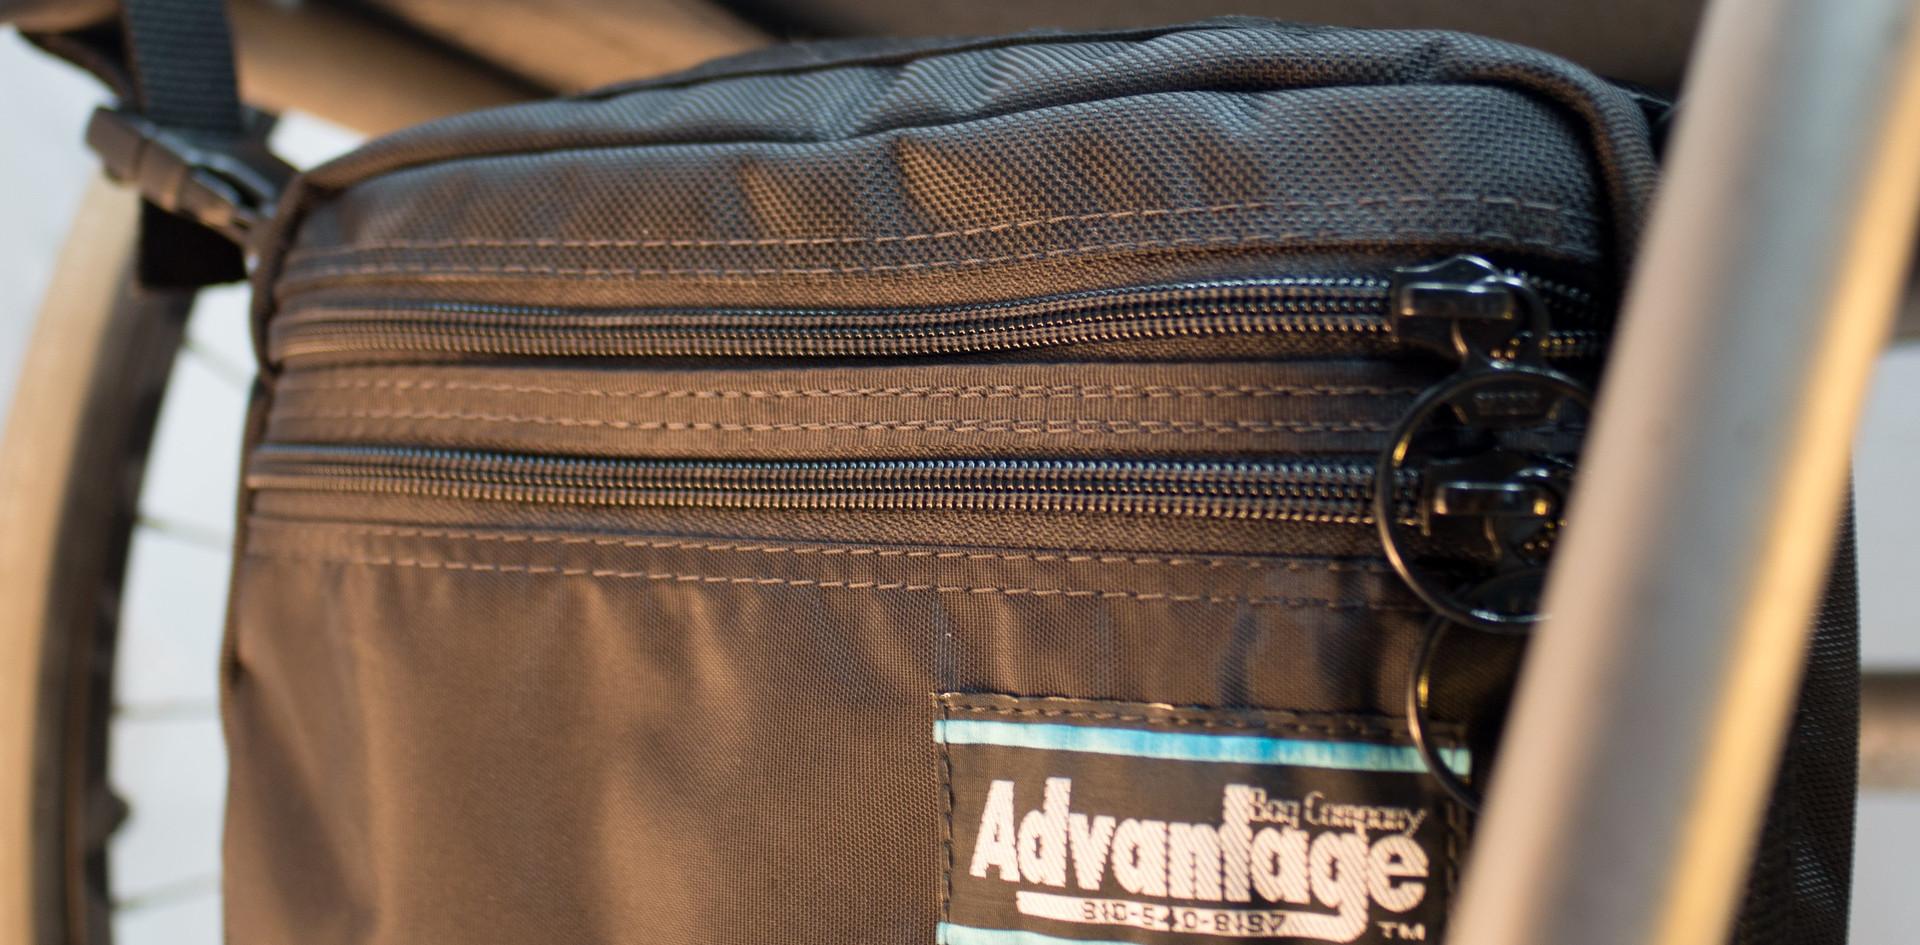 Advantage Bag